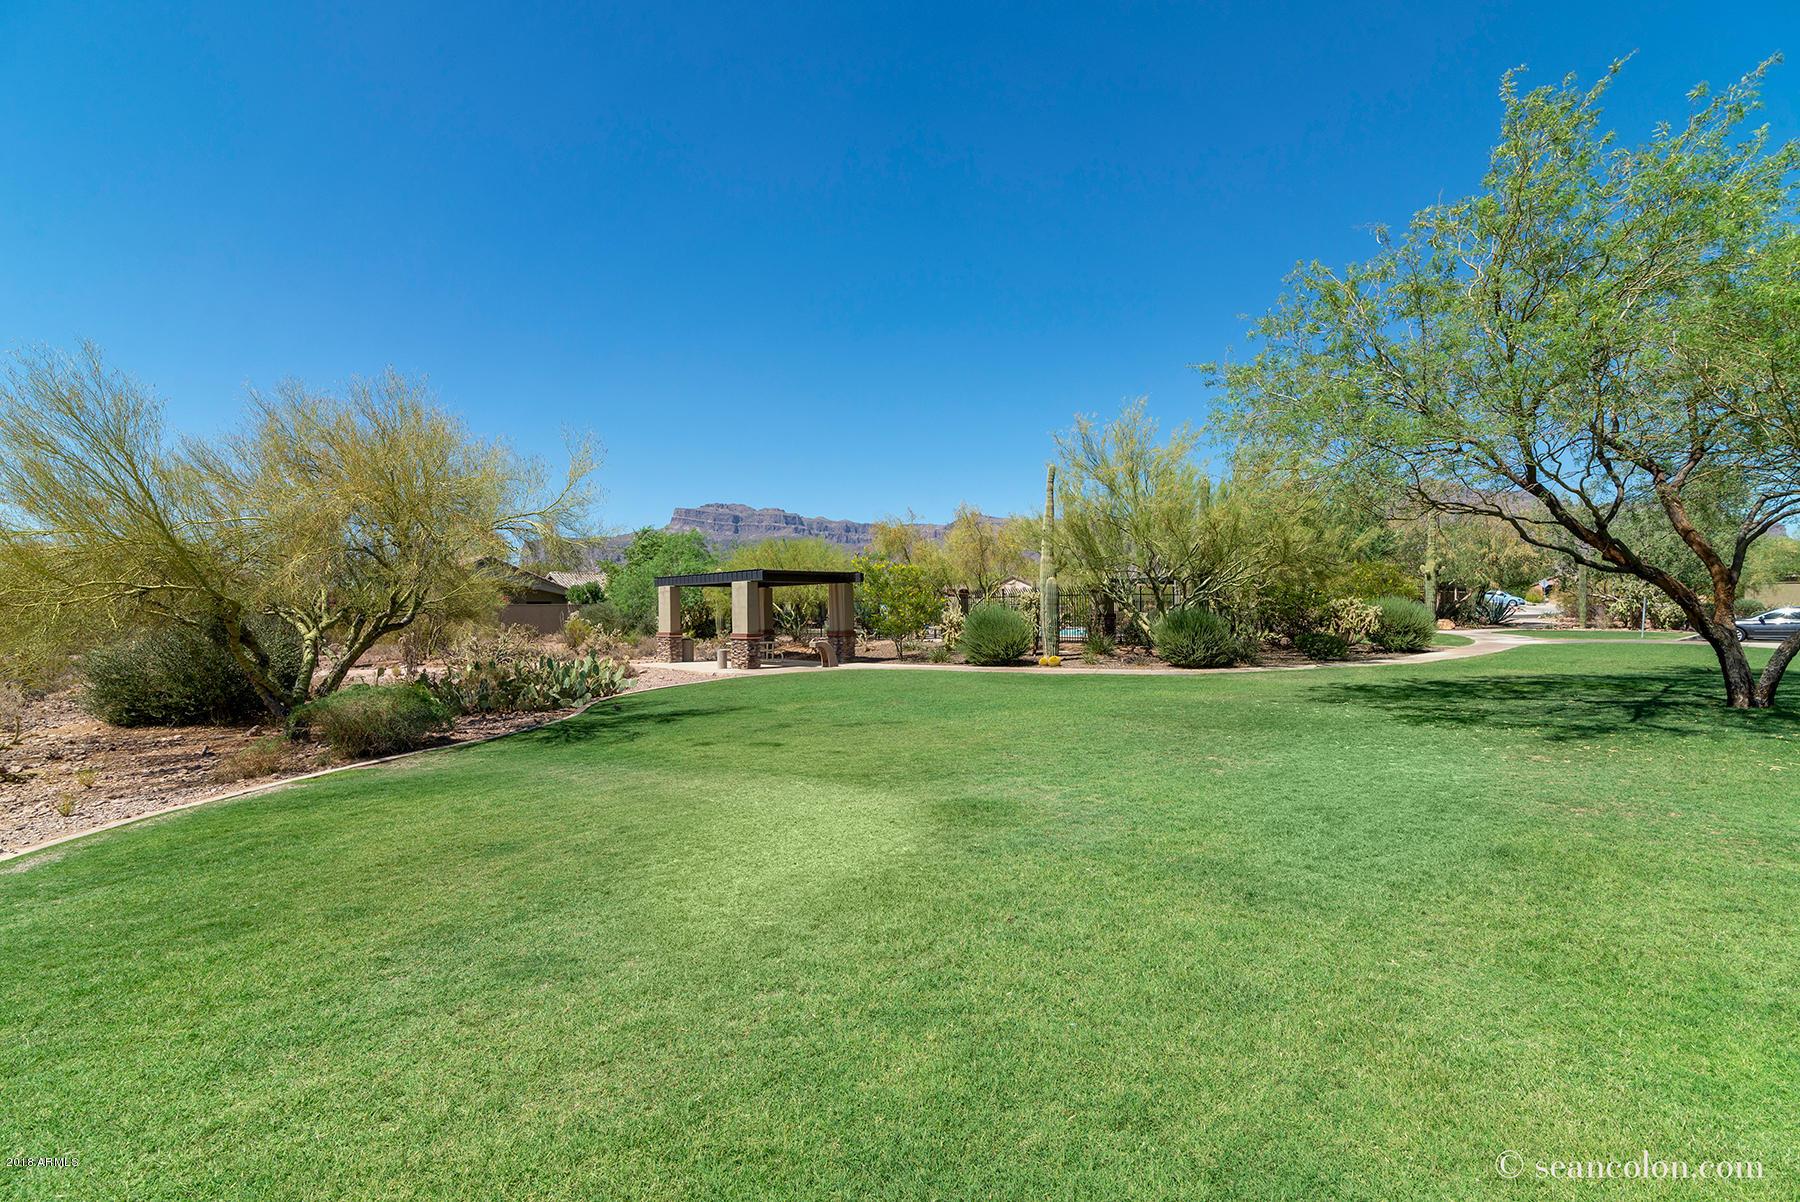 MLS 5829521 7616 E ELDERBERRY Way, Gold Canyon, AZ 85118 Gold Canyon AZ Gold Canyon Ranch